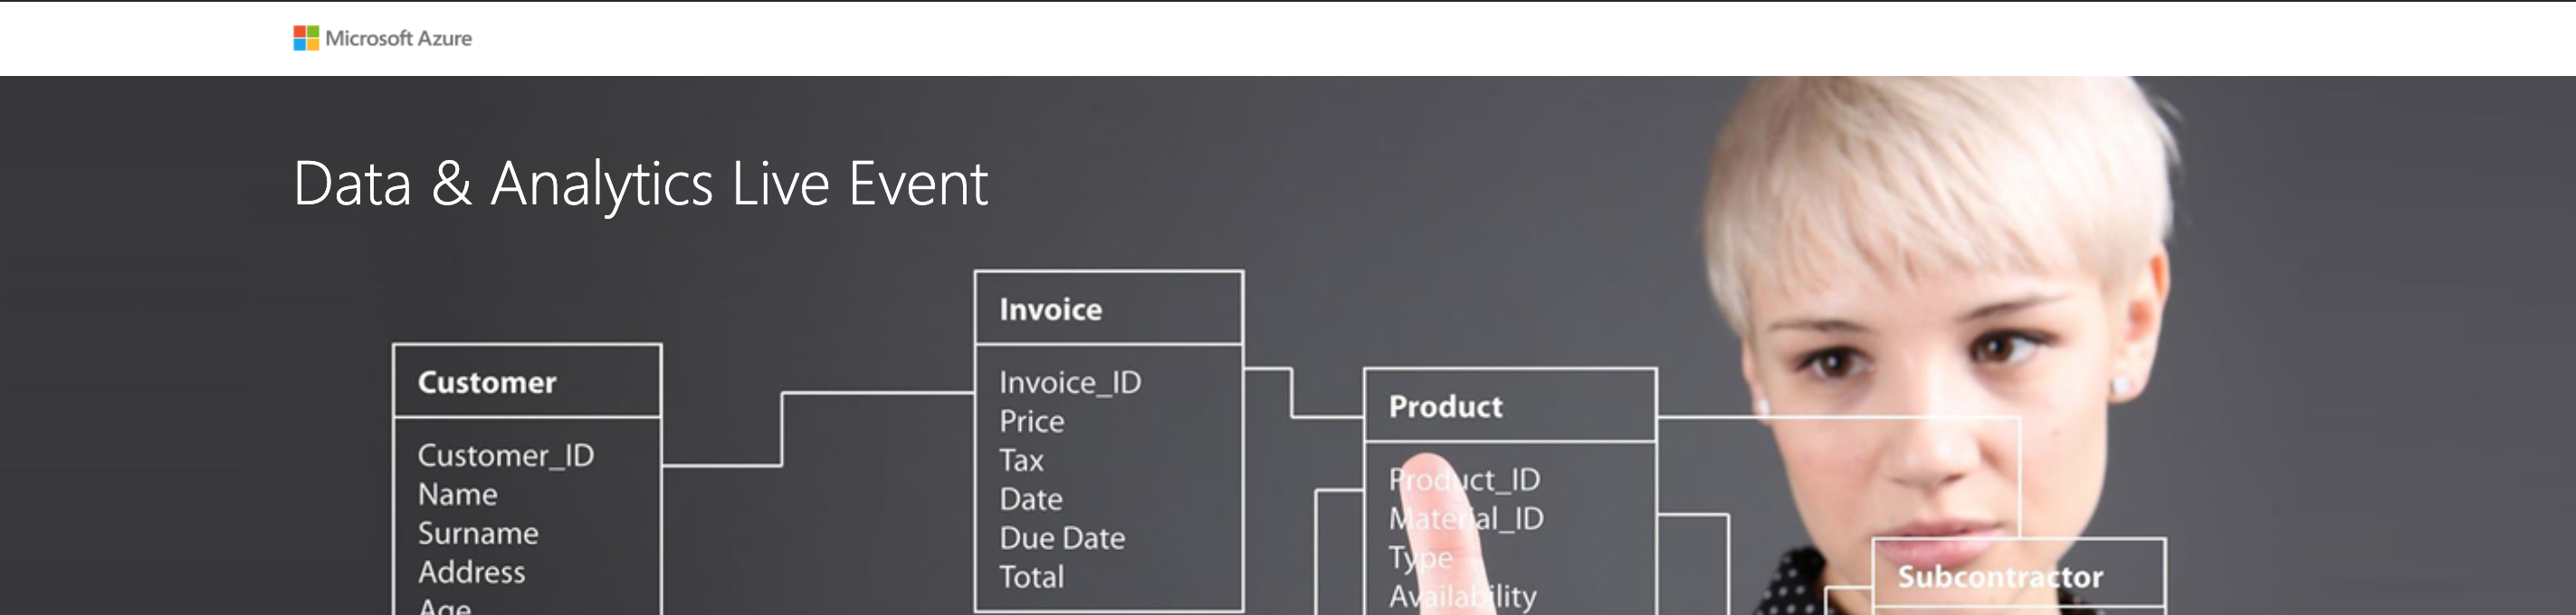 Microsoft Azure Data & Analytics Live Event